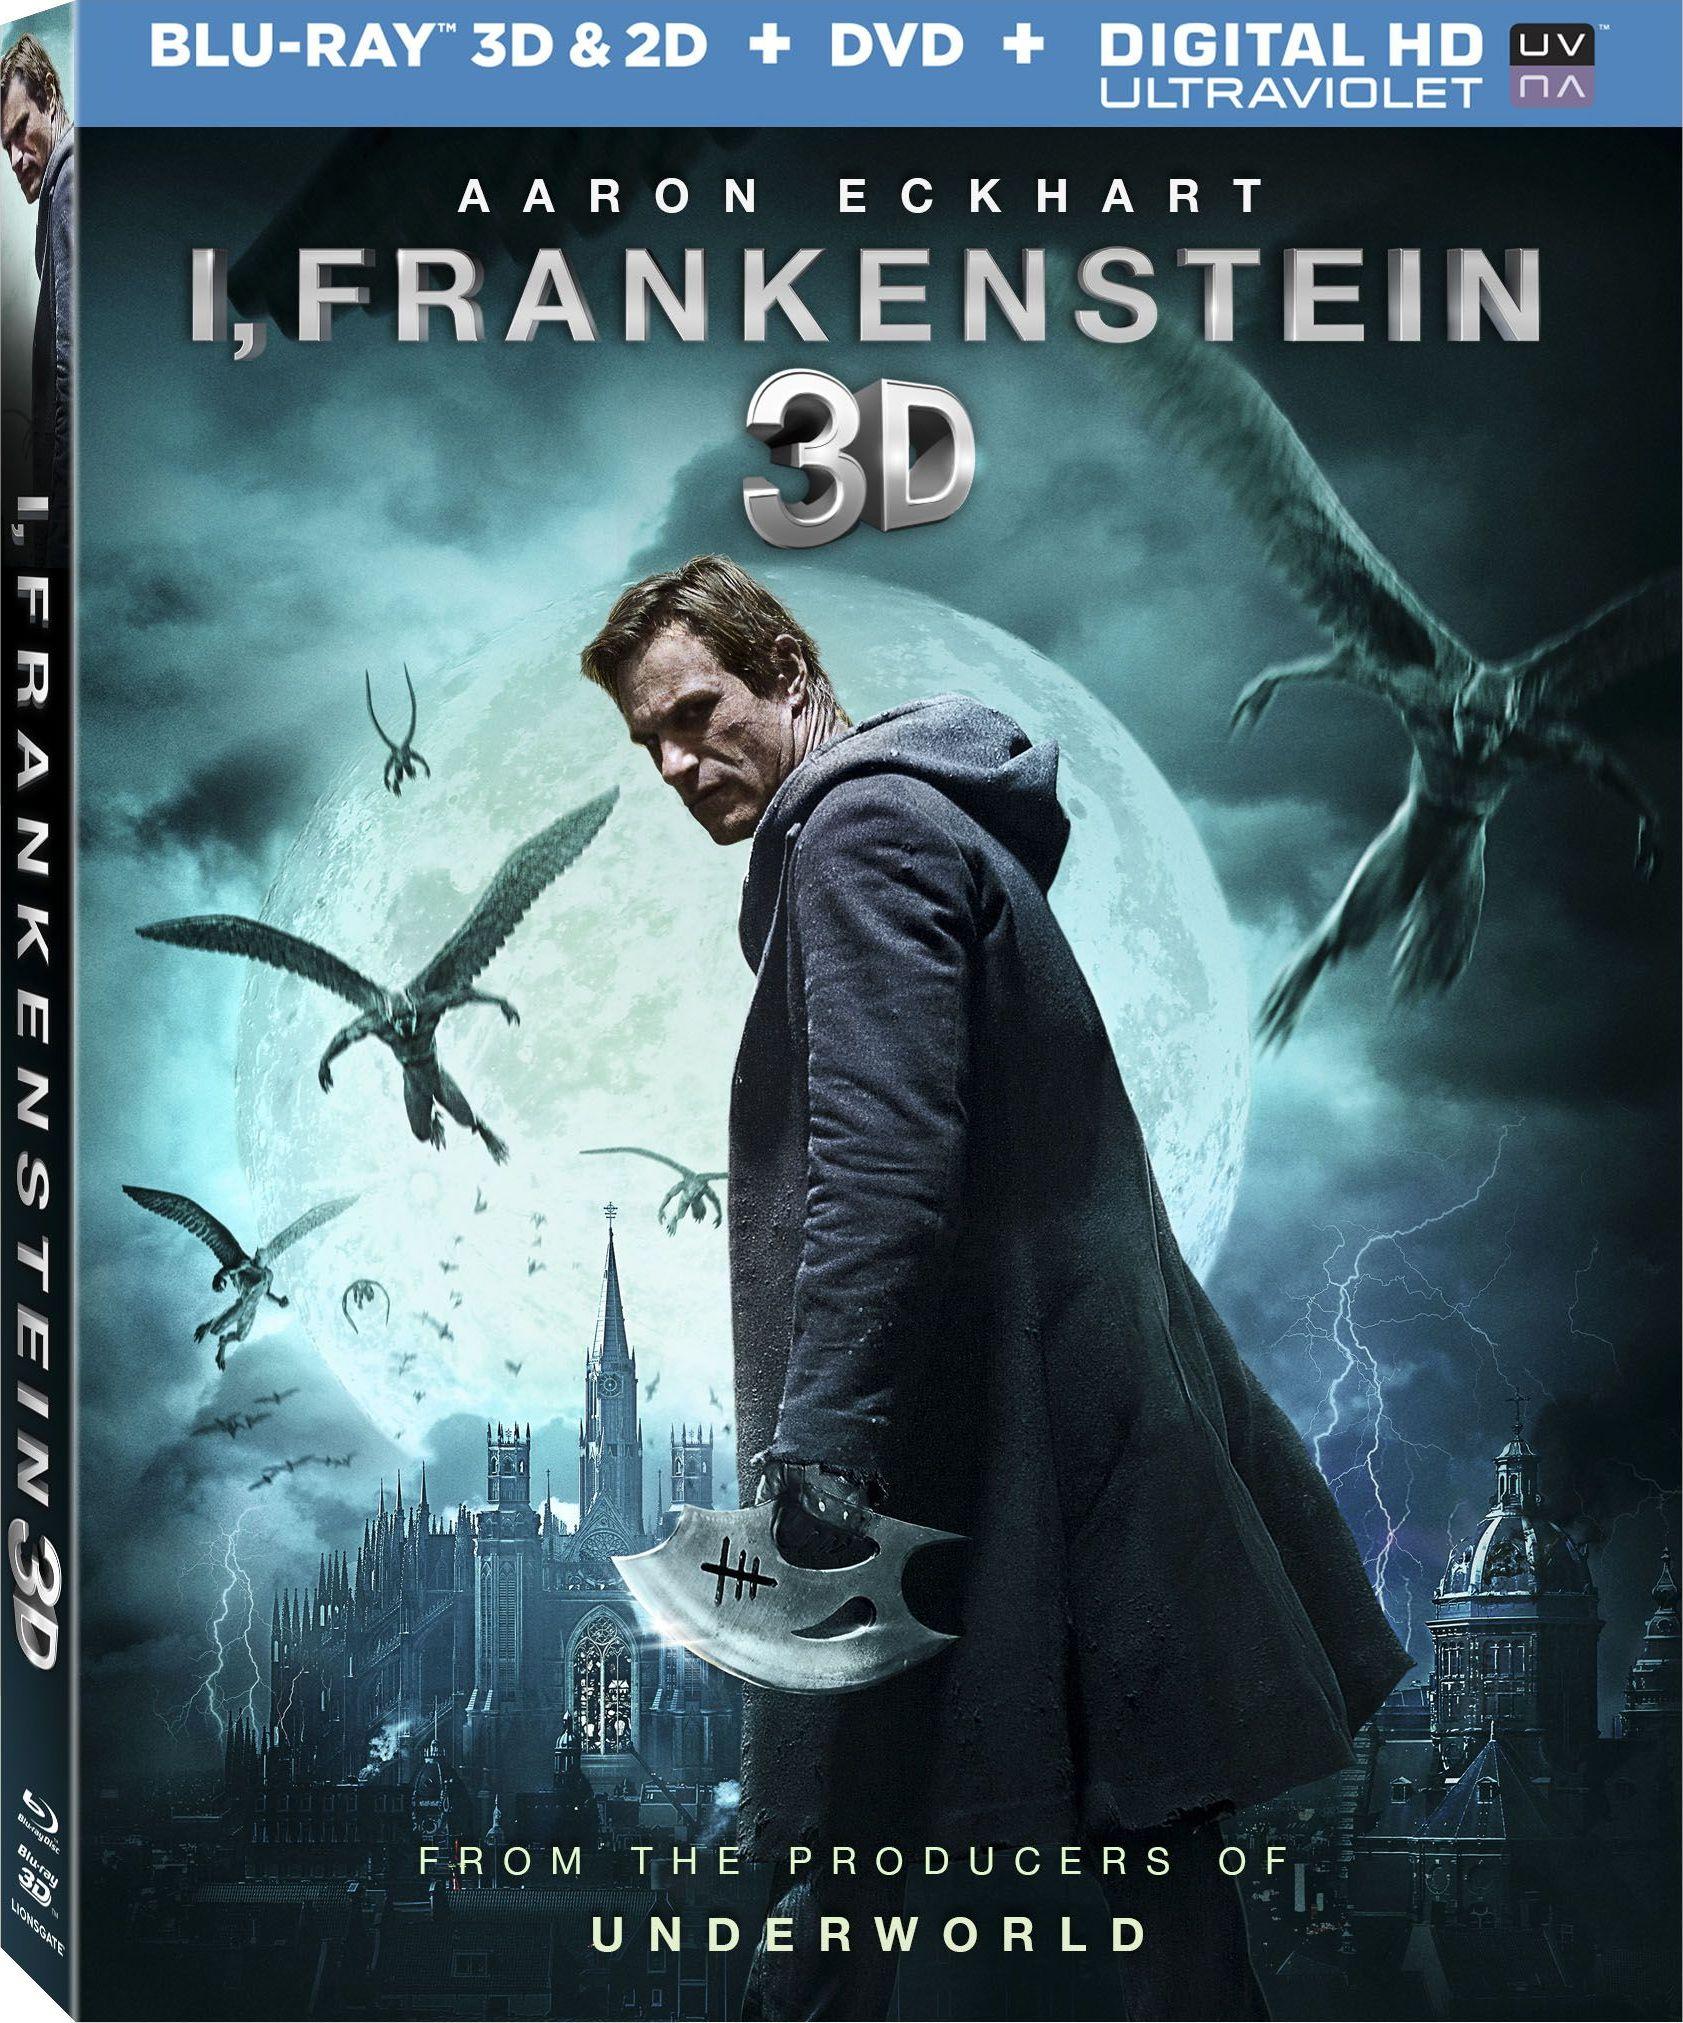 i, frankenstein 3d blu-ray